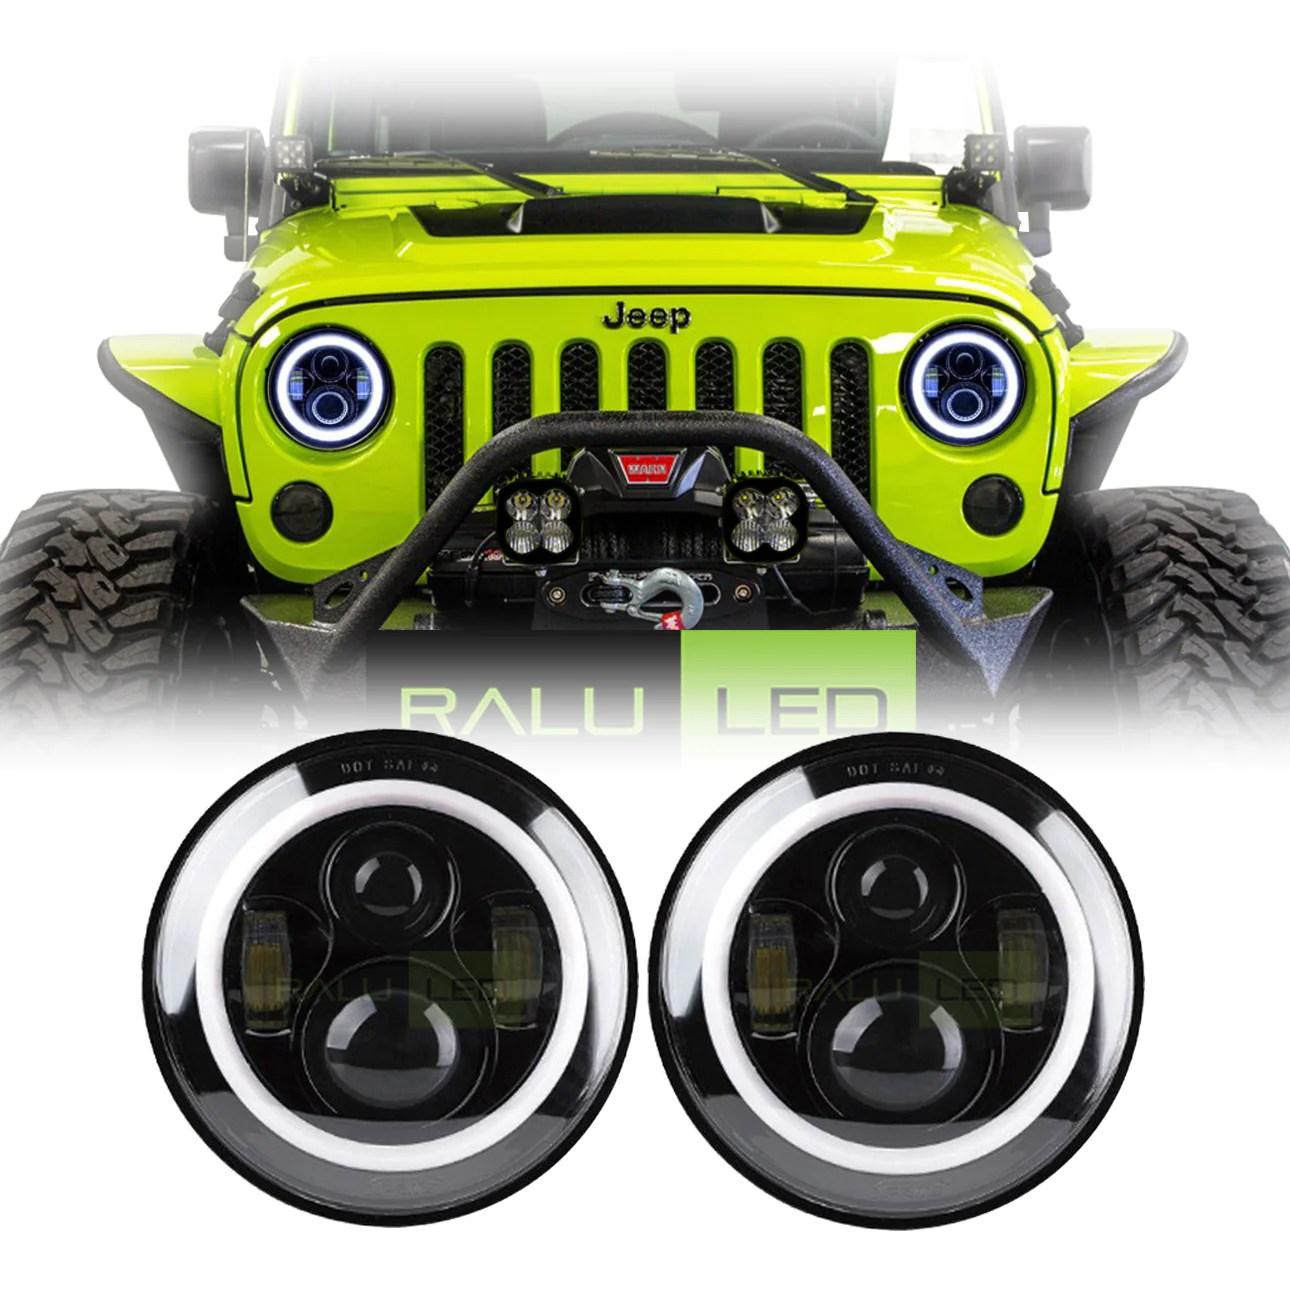 small resolution of jeep wrangler color halo led headlights jk jku tj 1997 2018 black